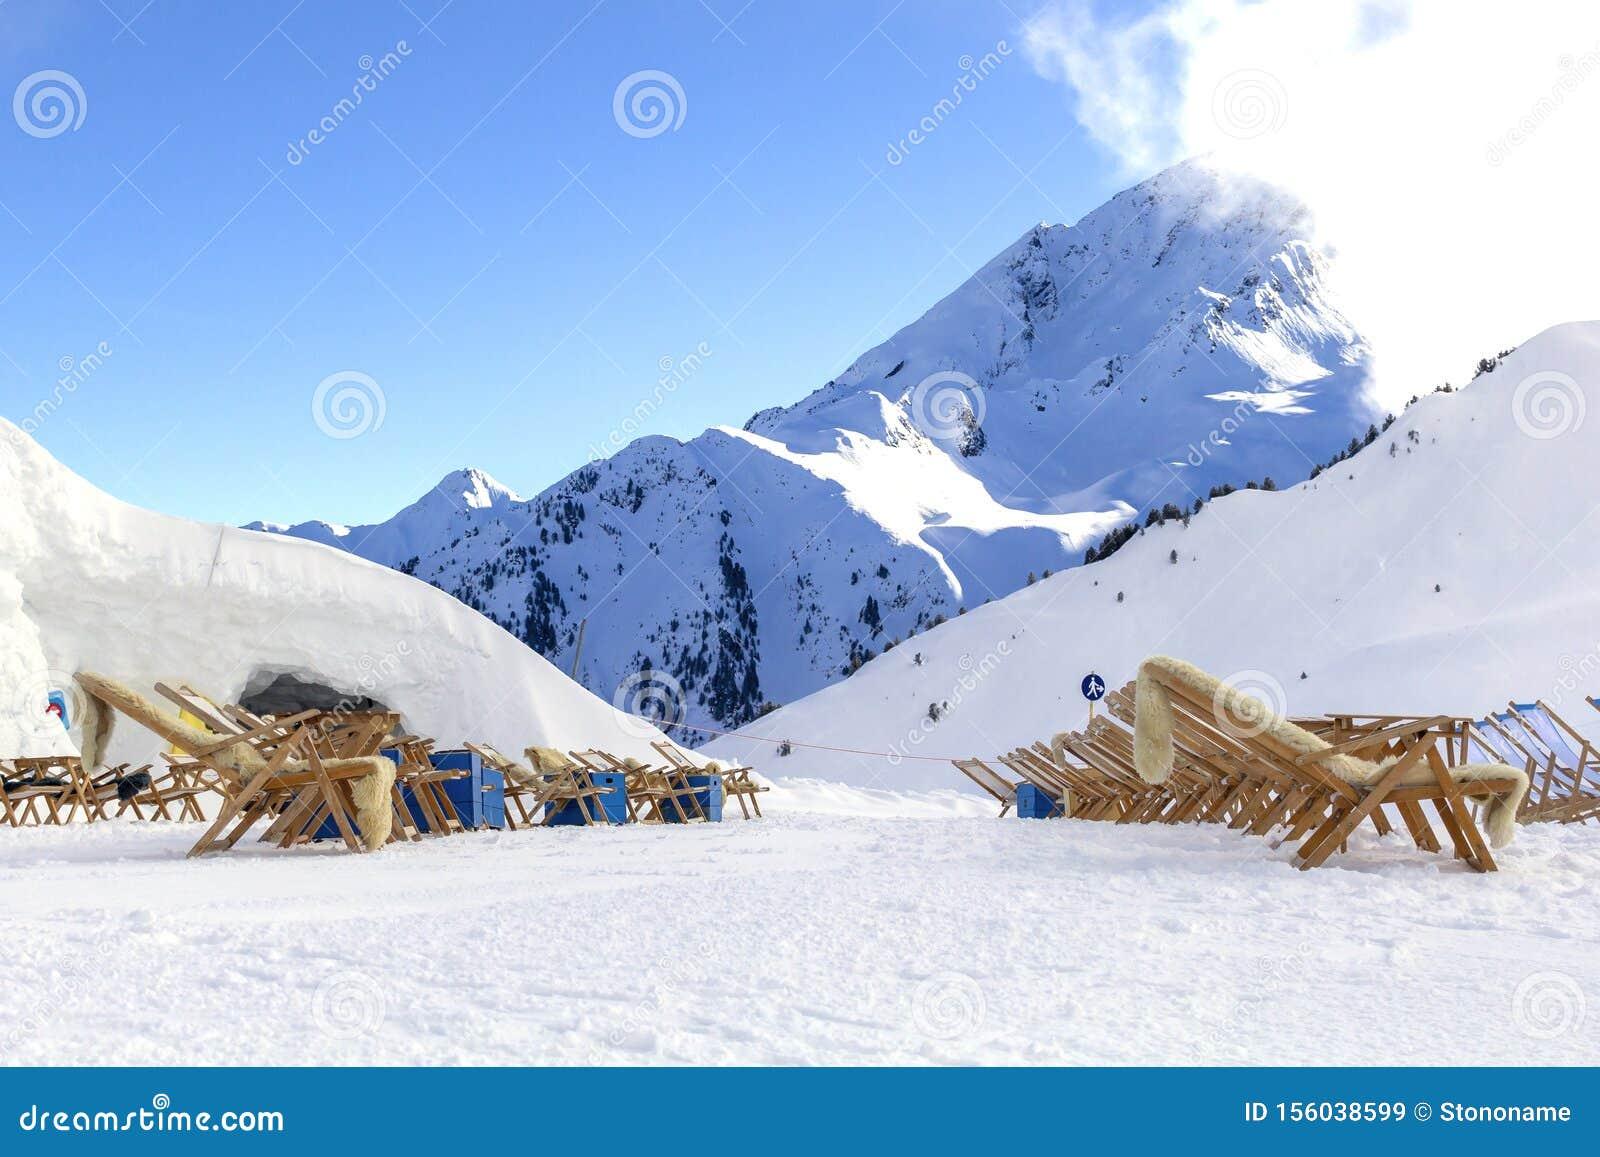 Austrian Alps ski resort in winter.Alpine Alps mountain landscape at Tirol, Top of Europe